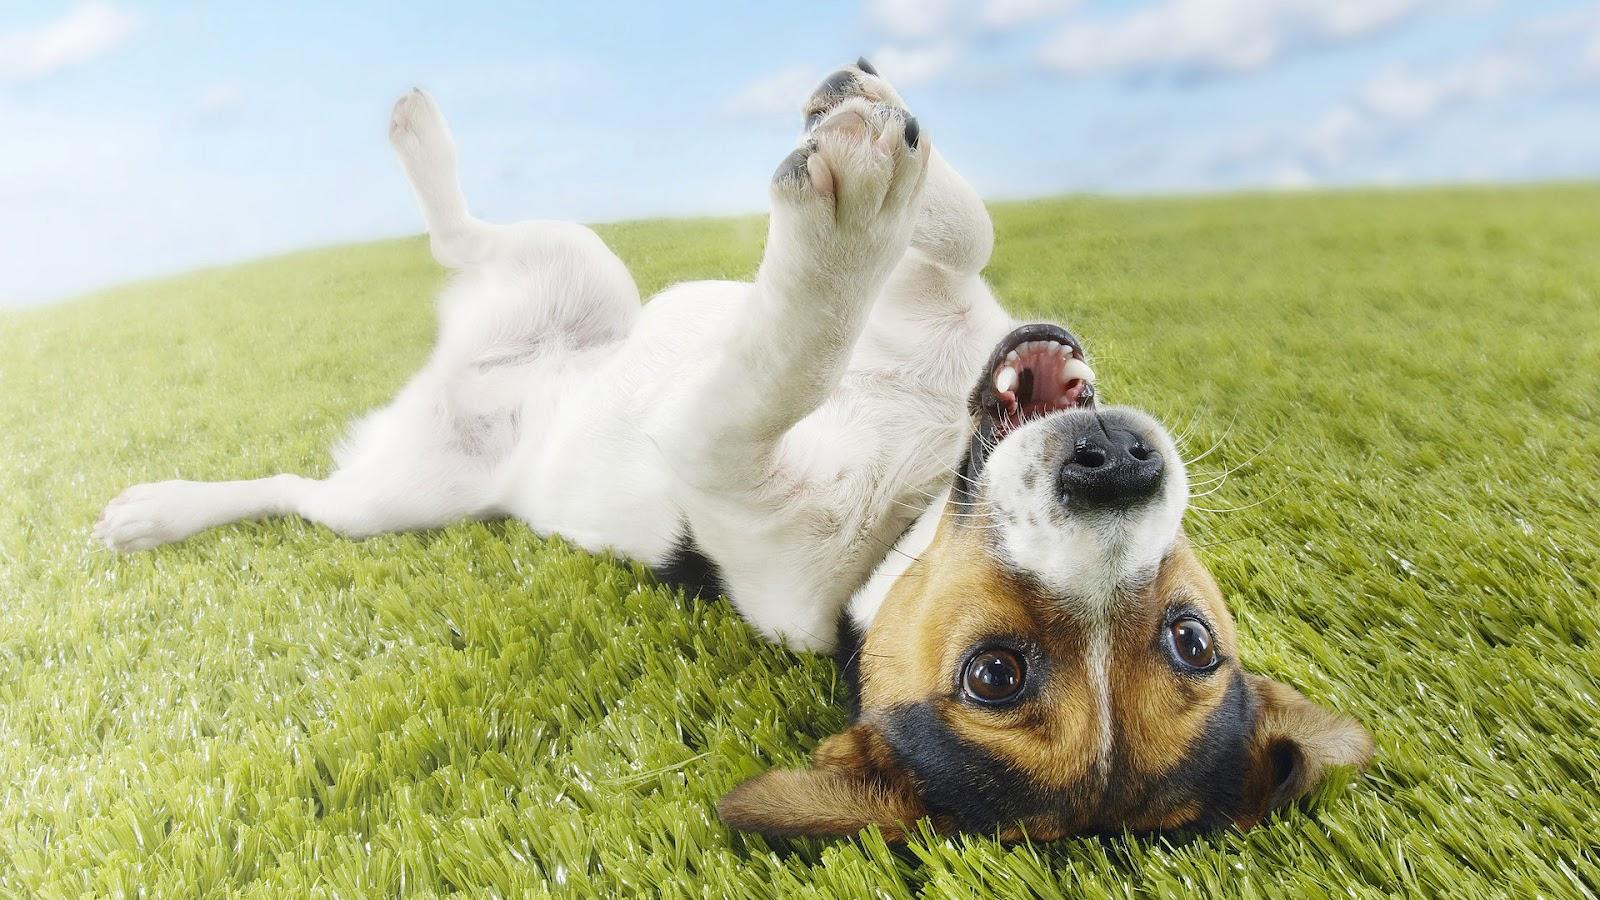 Dog Wallpapers Dog Desktop Images Hd Dog Images Hairy Dogs Pets rh